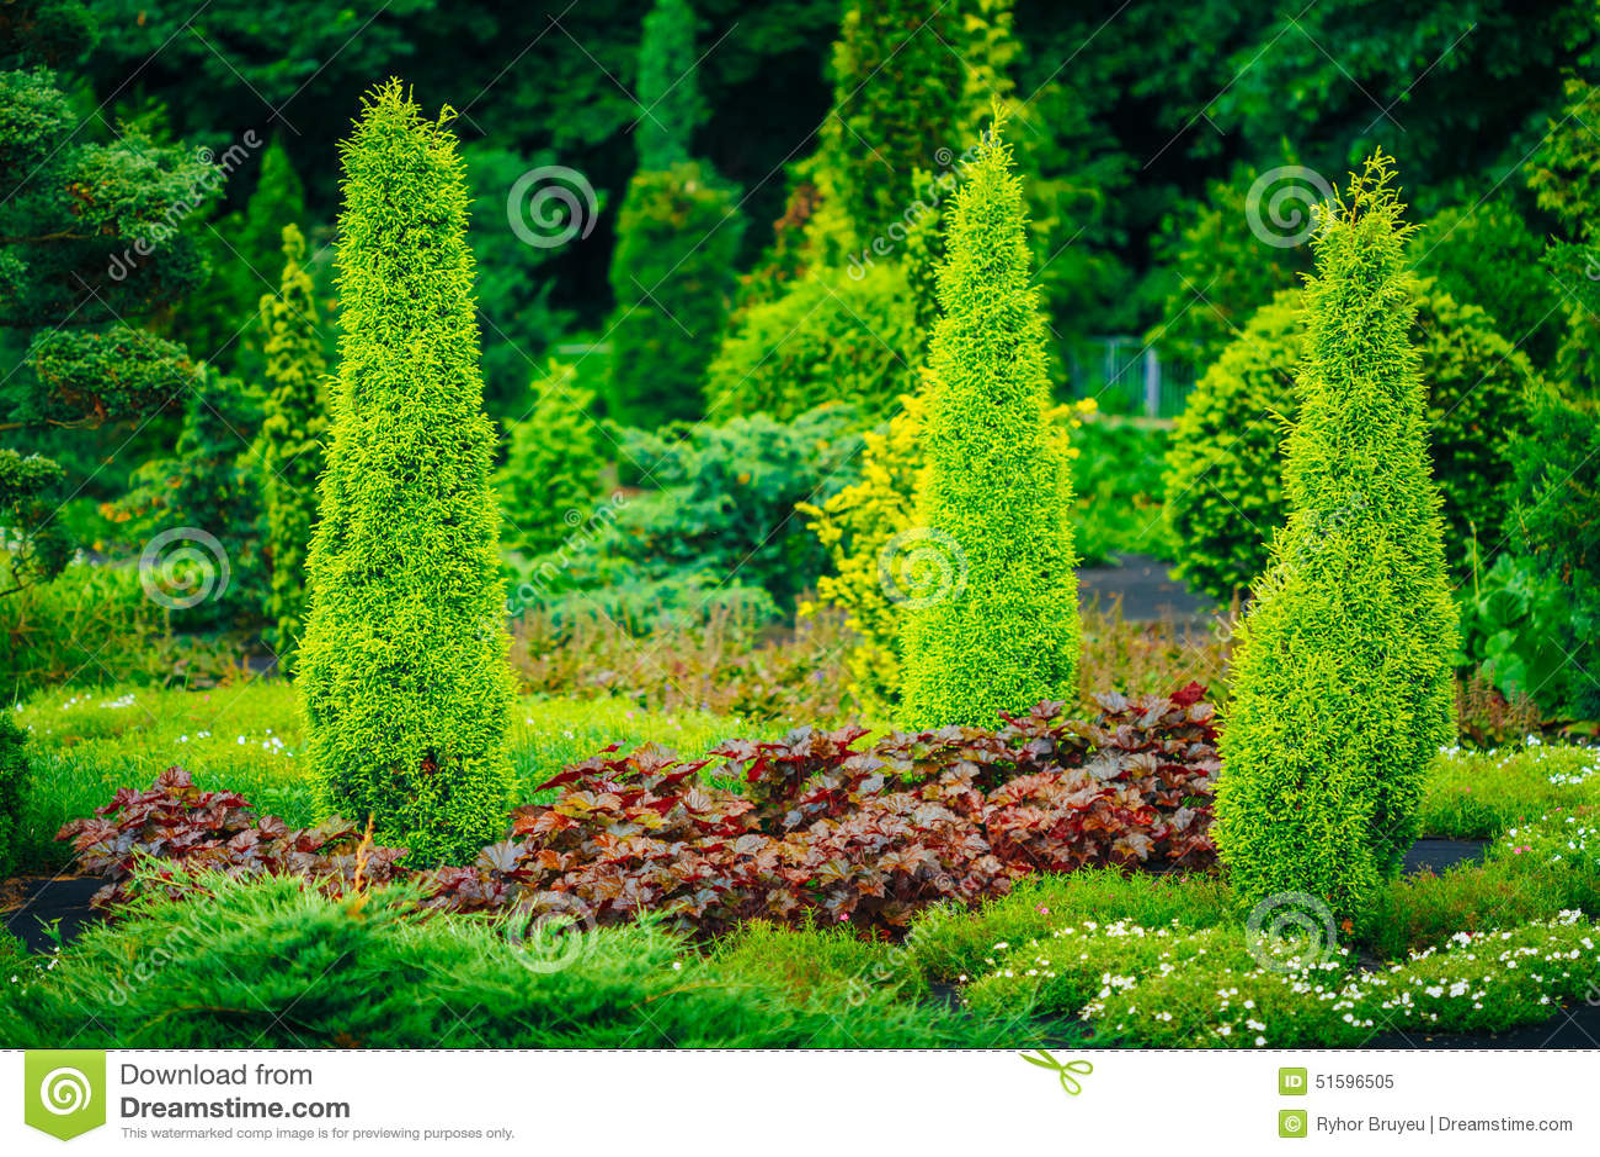 Garden landscaping design flower bed green trees stock for Small trees for flower beds